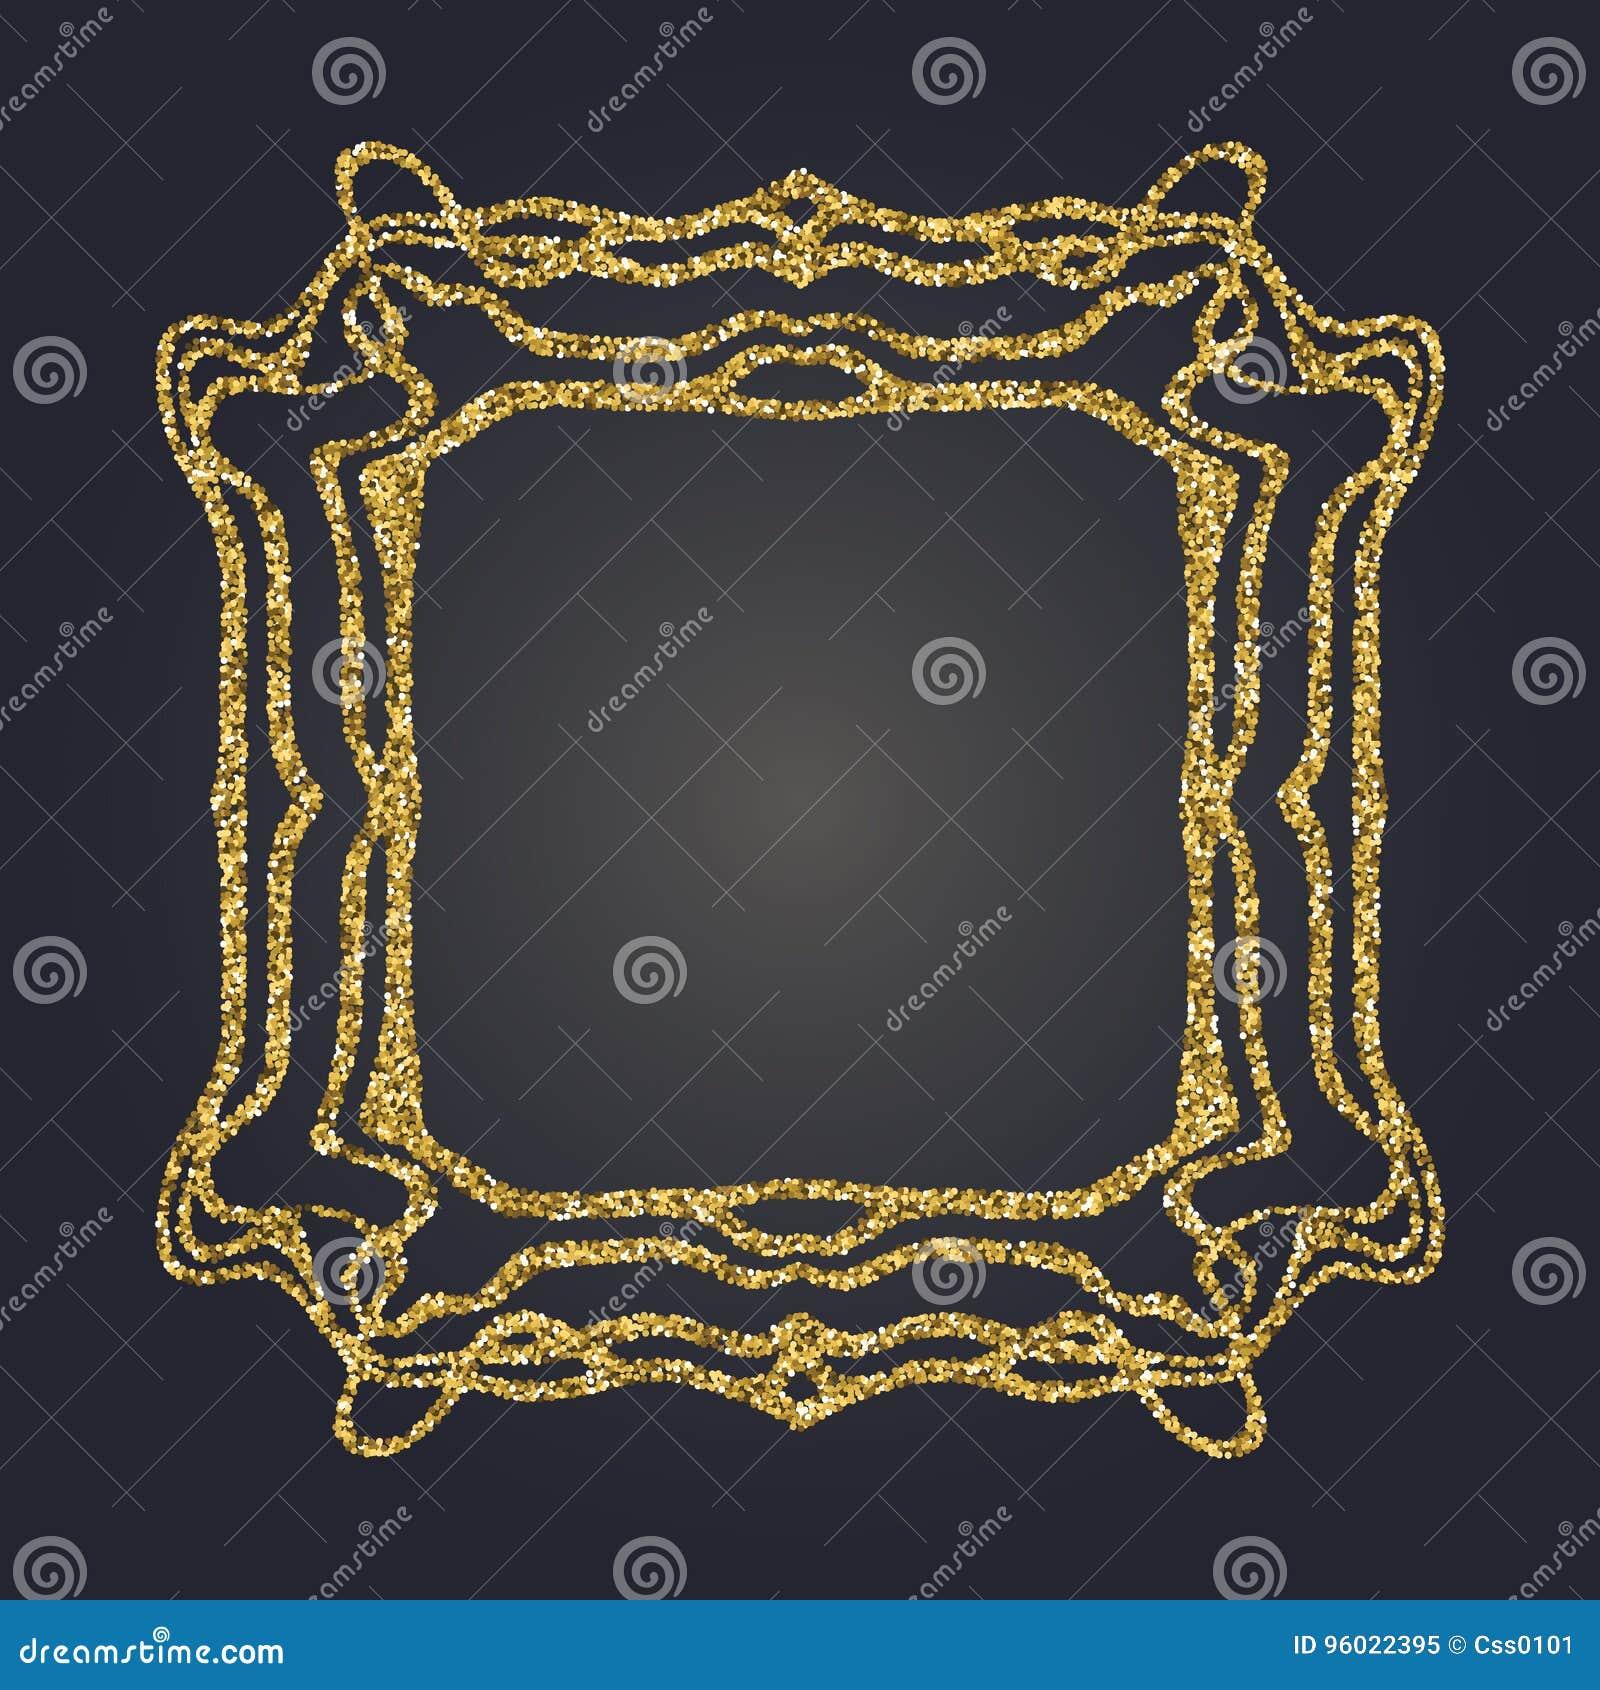 Art Nouveau Gold Glitter Decorative Rectangle Vector Frame For